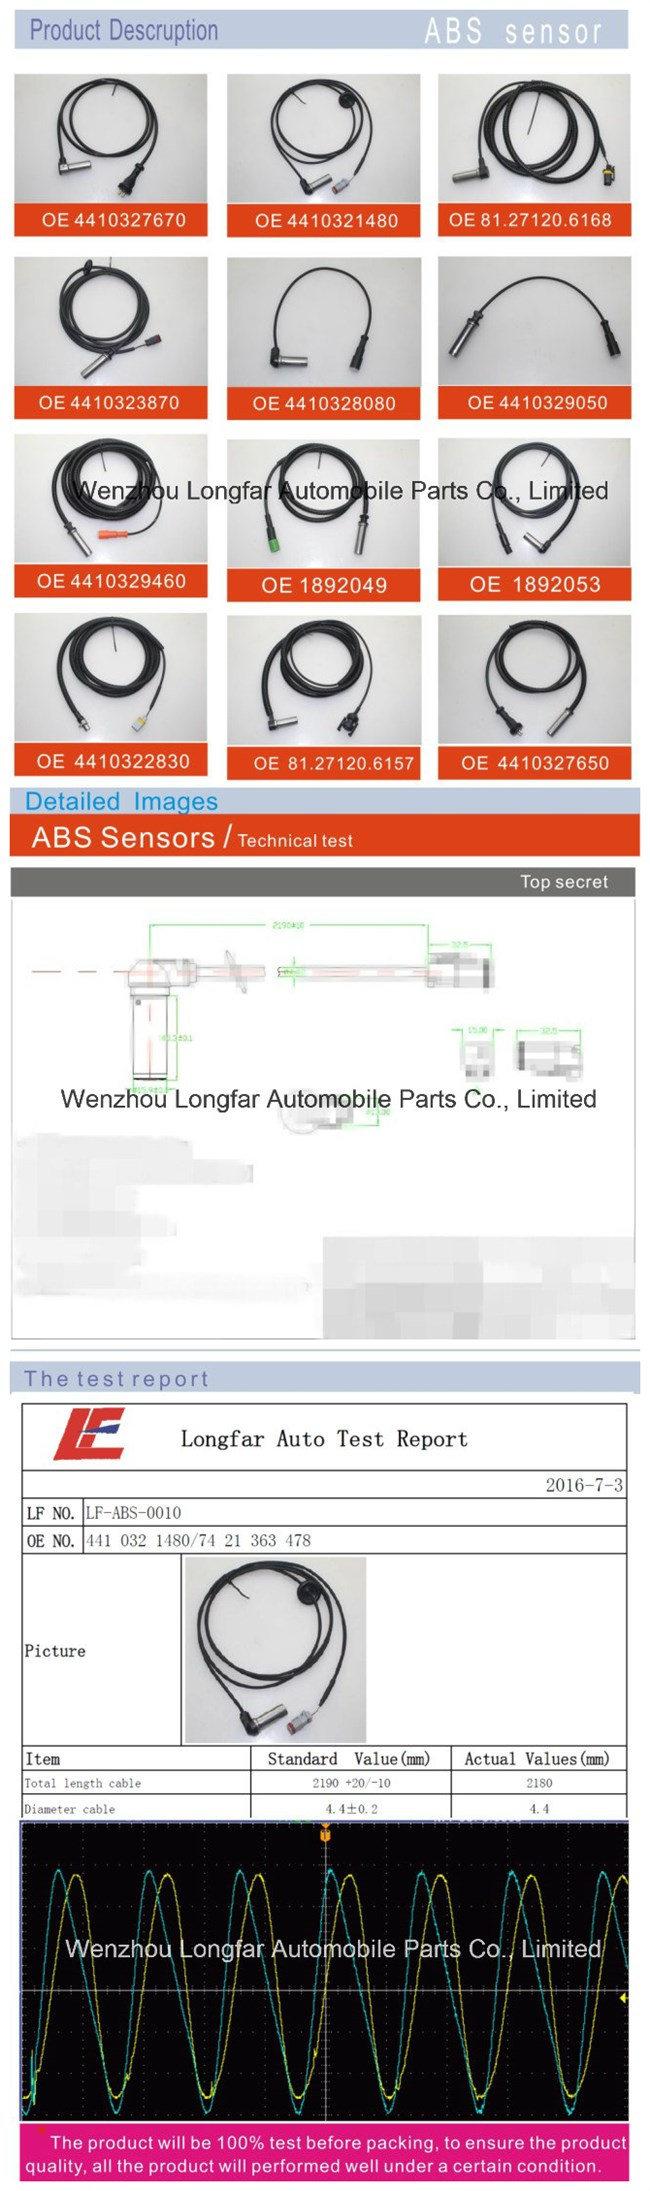 ABS Sensor Anti-Lock Braking System Transducer Indicator Sensor 4410323860, 20528660, 21247147, 096.252, 85-50531-Sx, 2.25332, 2260132, Bk8400for Volvo Renault